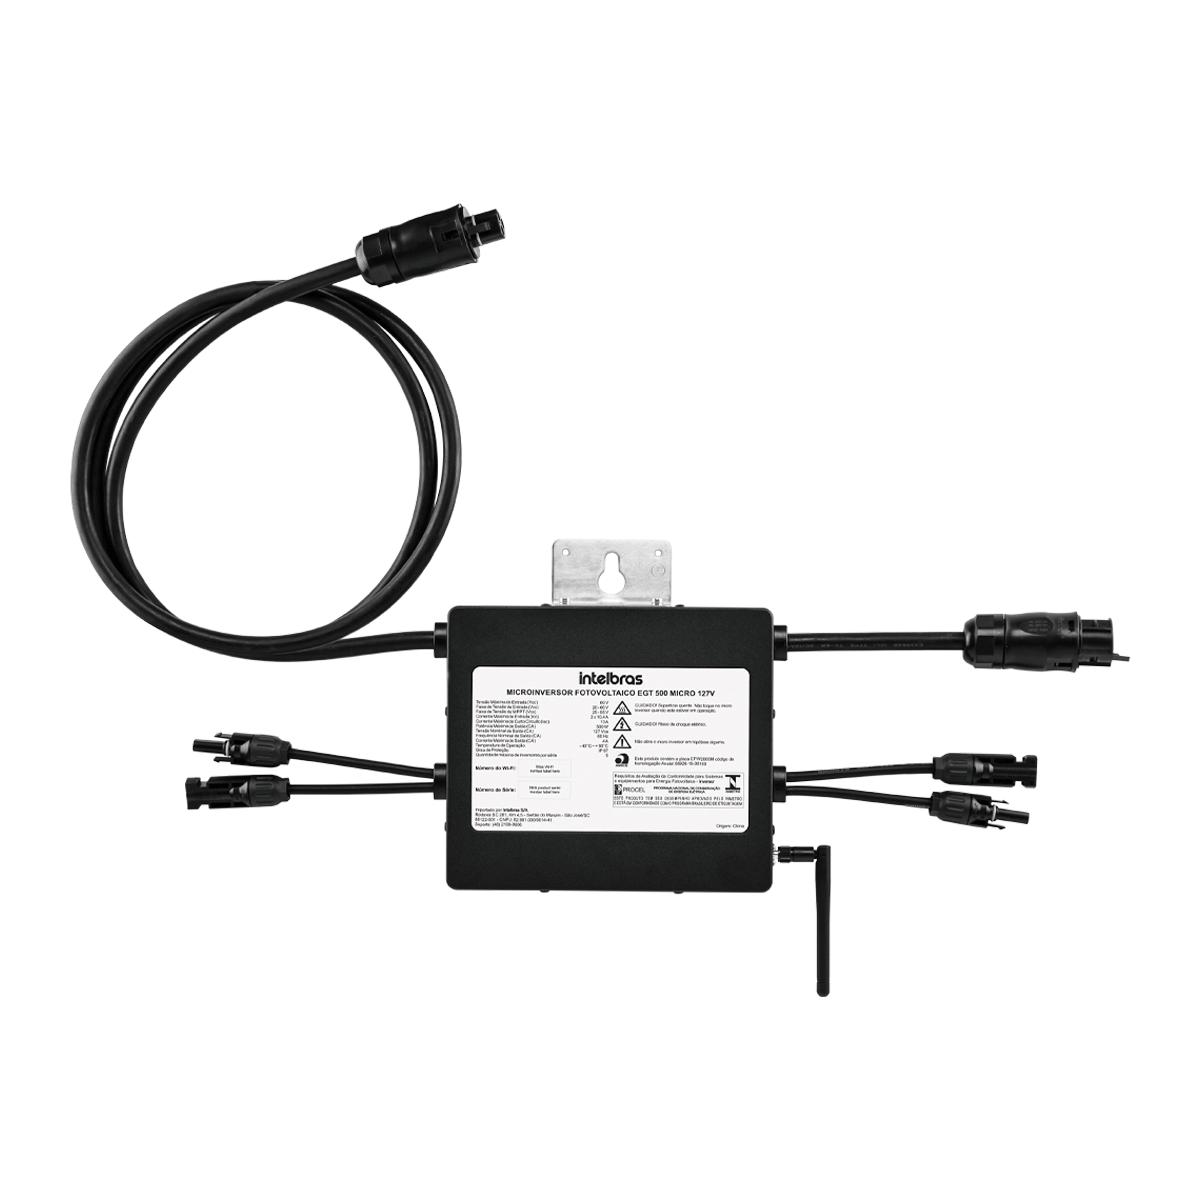 Microinversor Fotovoltaico Intelbras EGT 500 Micro 127V